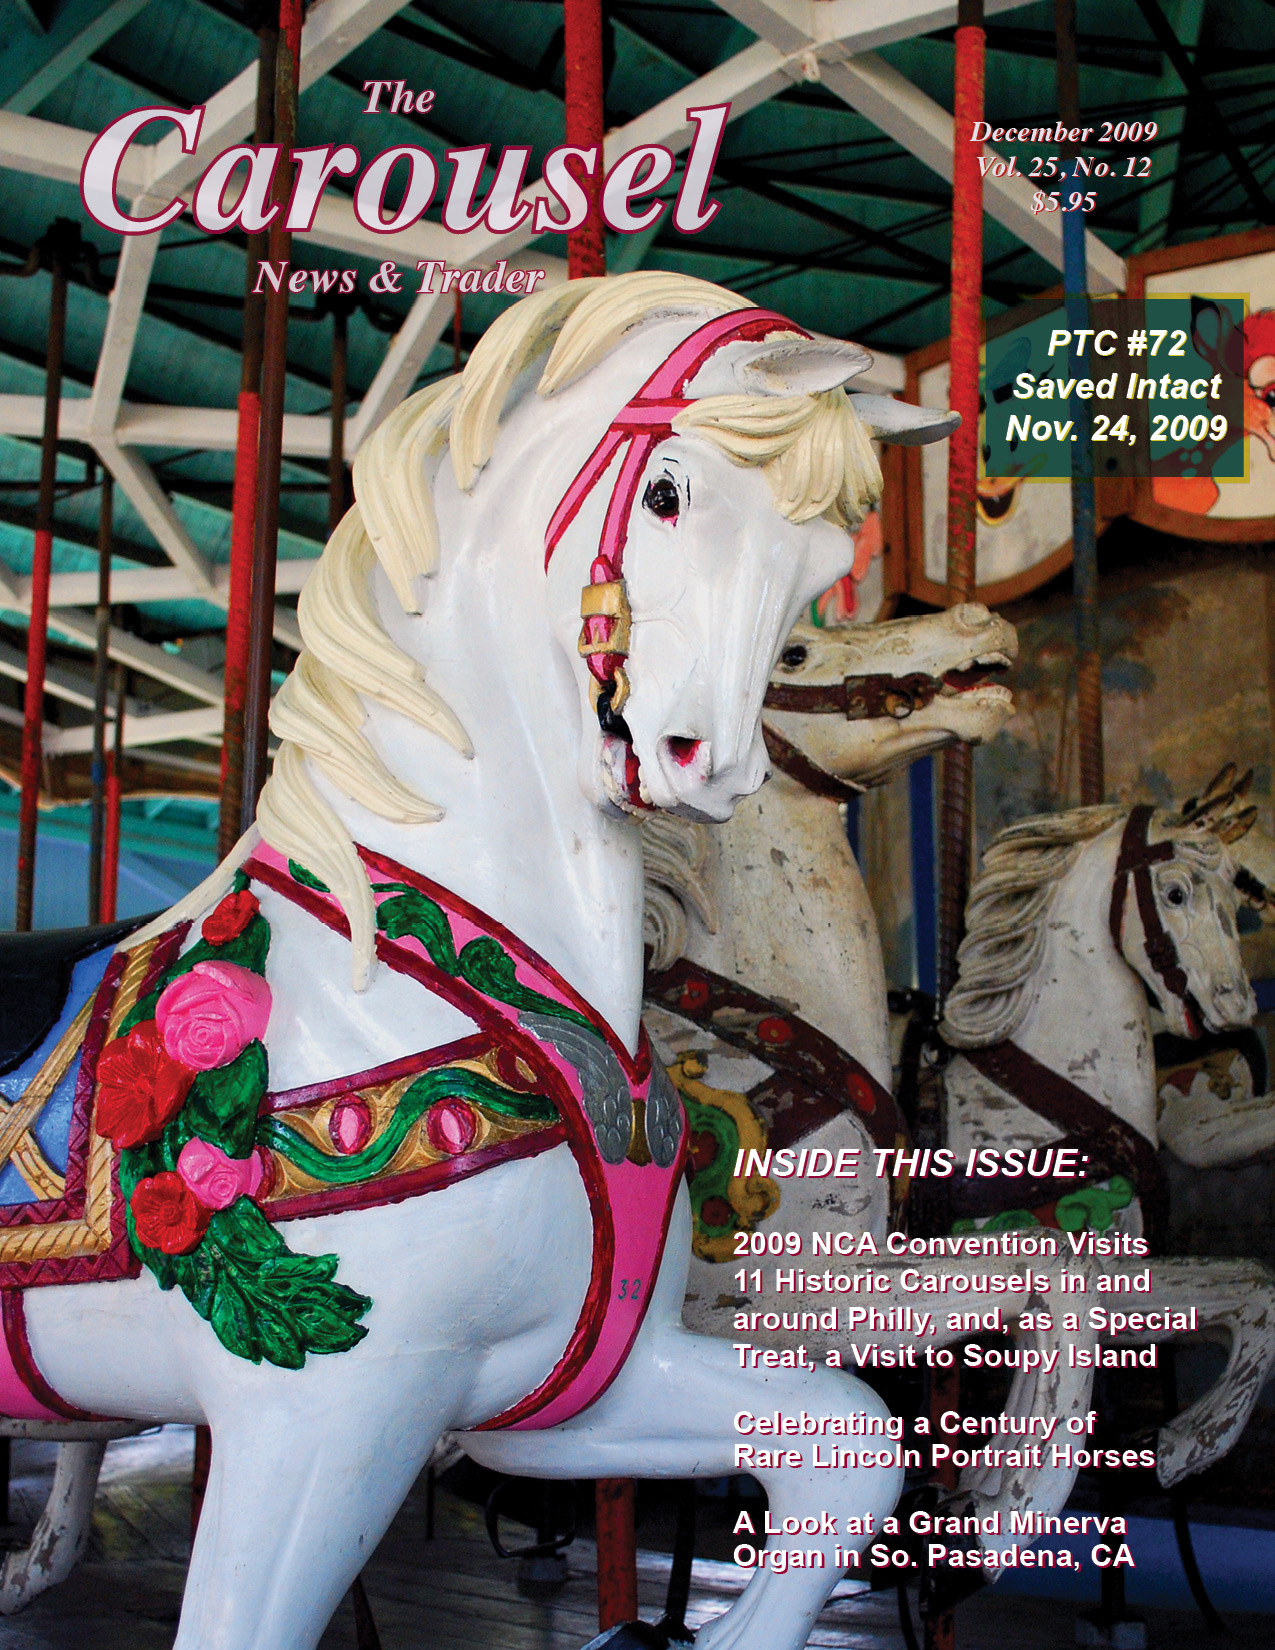 Carousel-news-cover-12-Soupy-Island-Heyn-carousel-December-2009